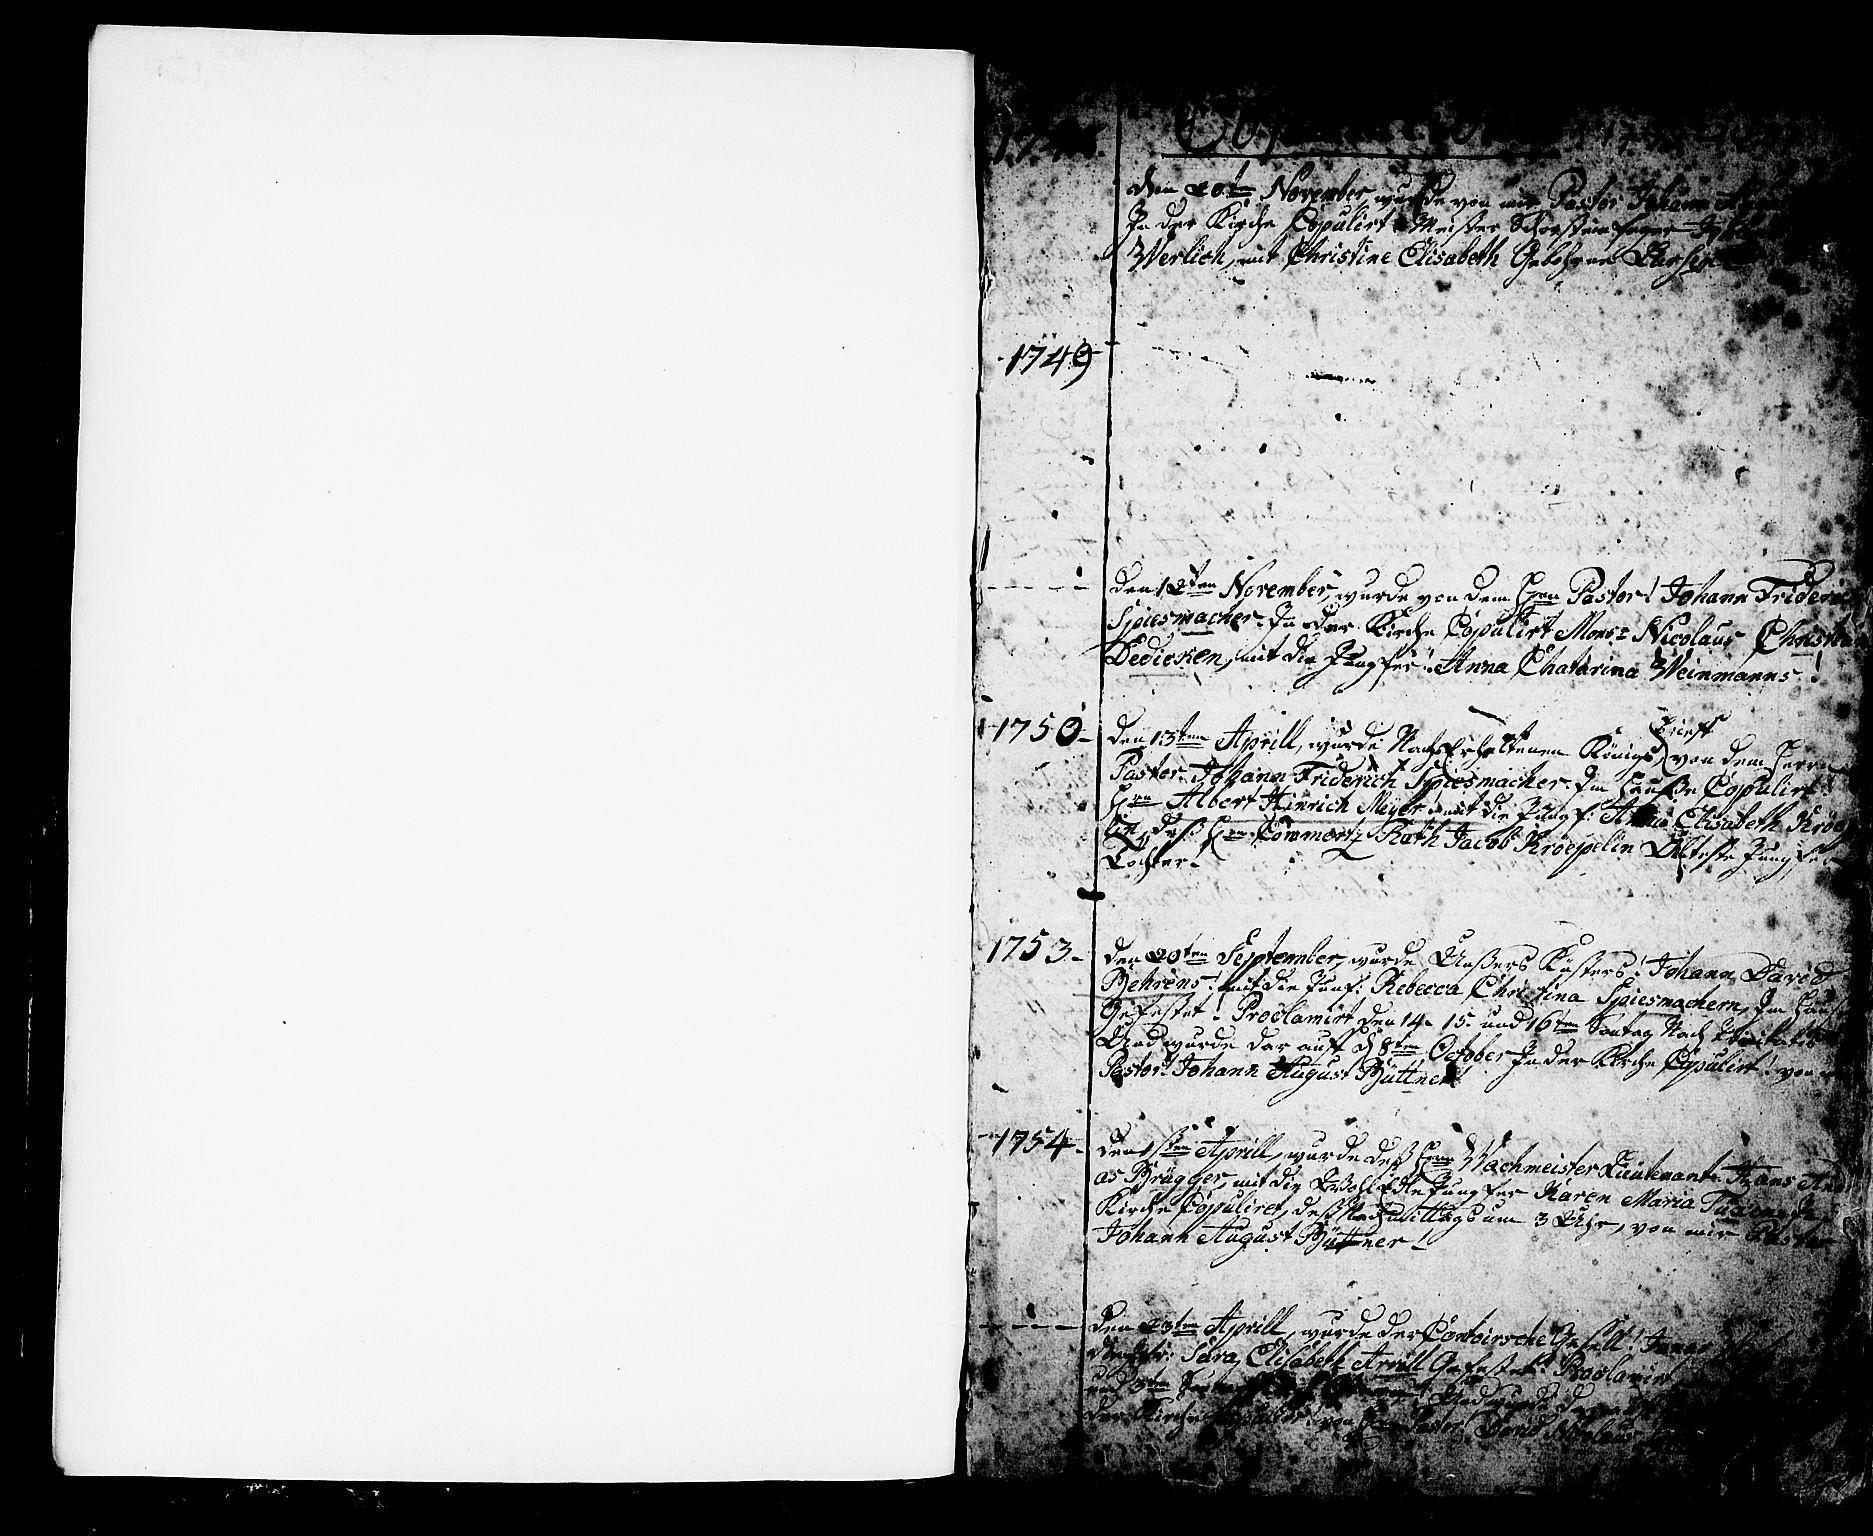 SAB, Mariakirken Sokneprestembete, H/Haa/L0002: Ministerialbok nr. A 2, 1748-1807, s. 1